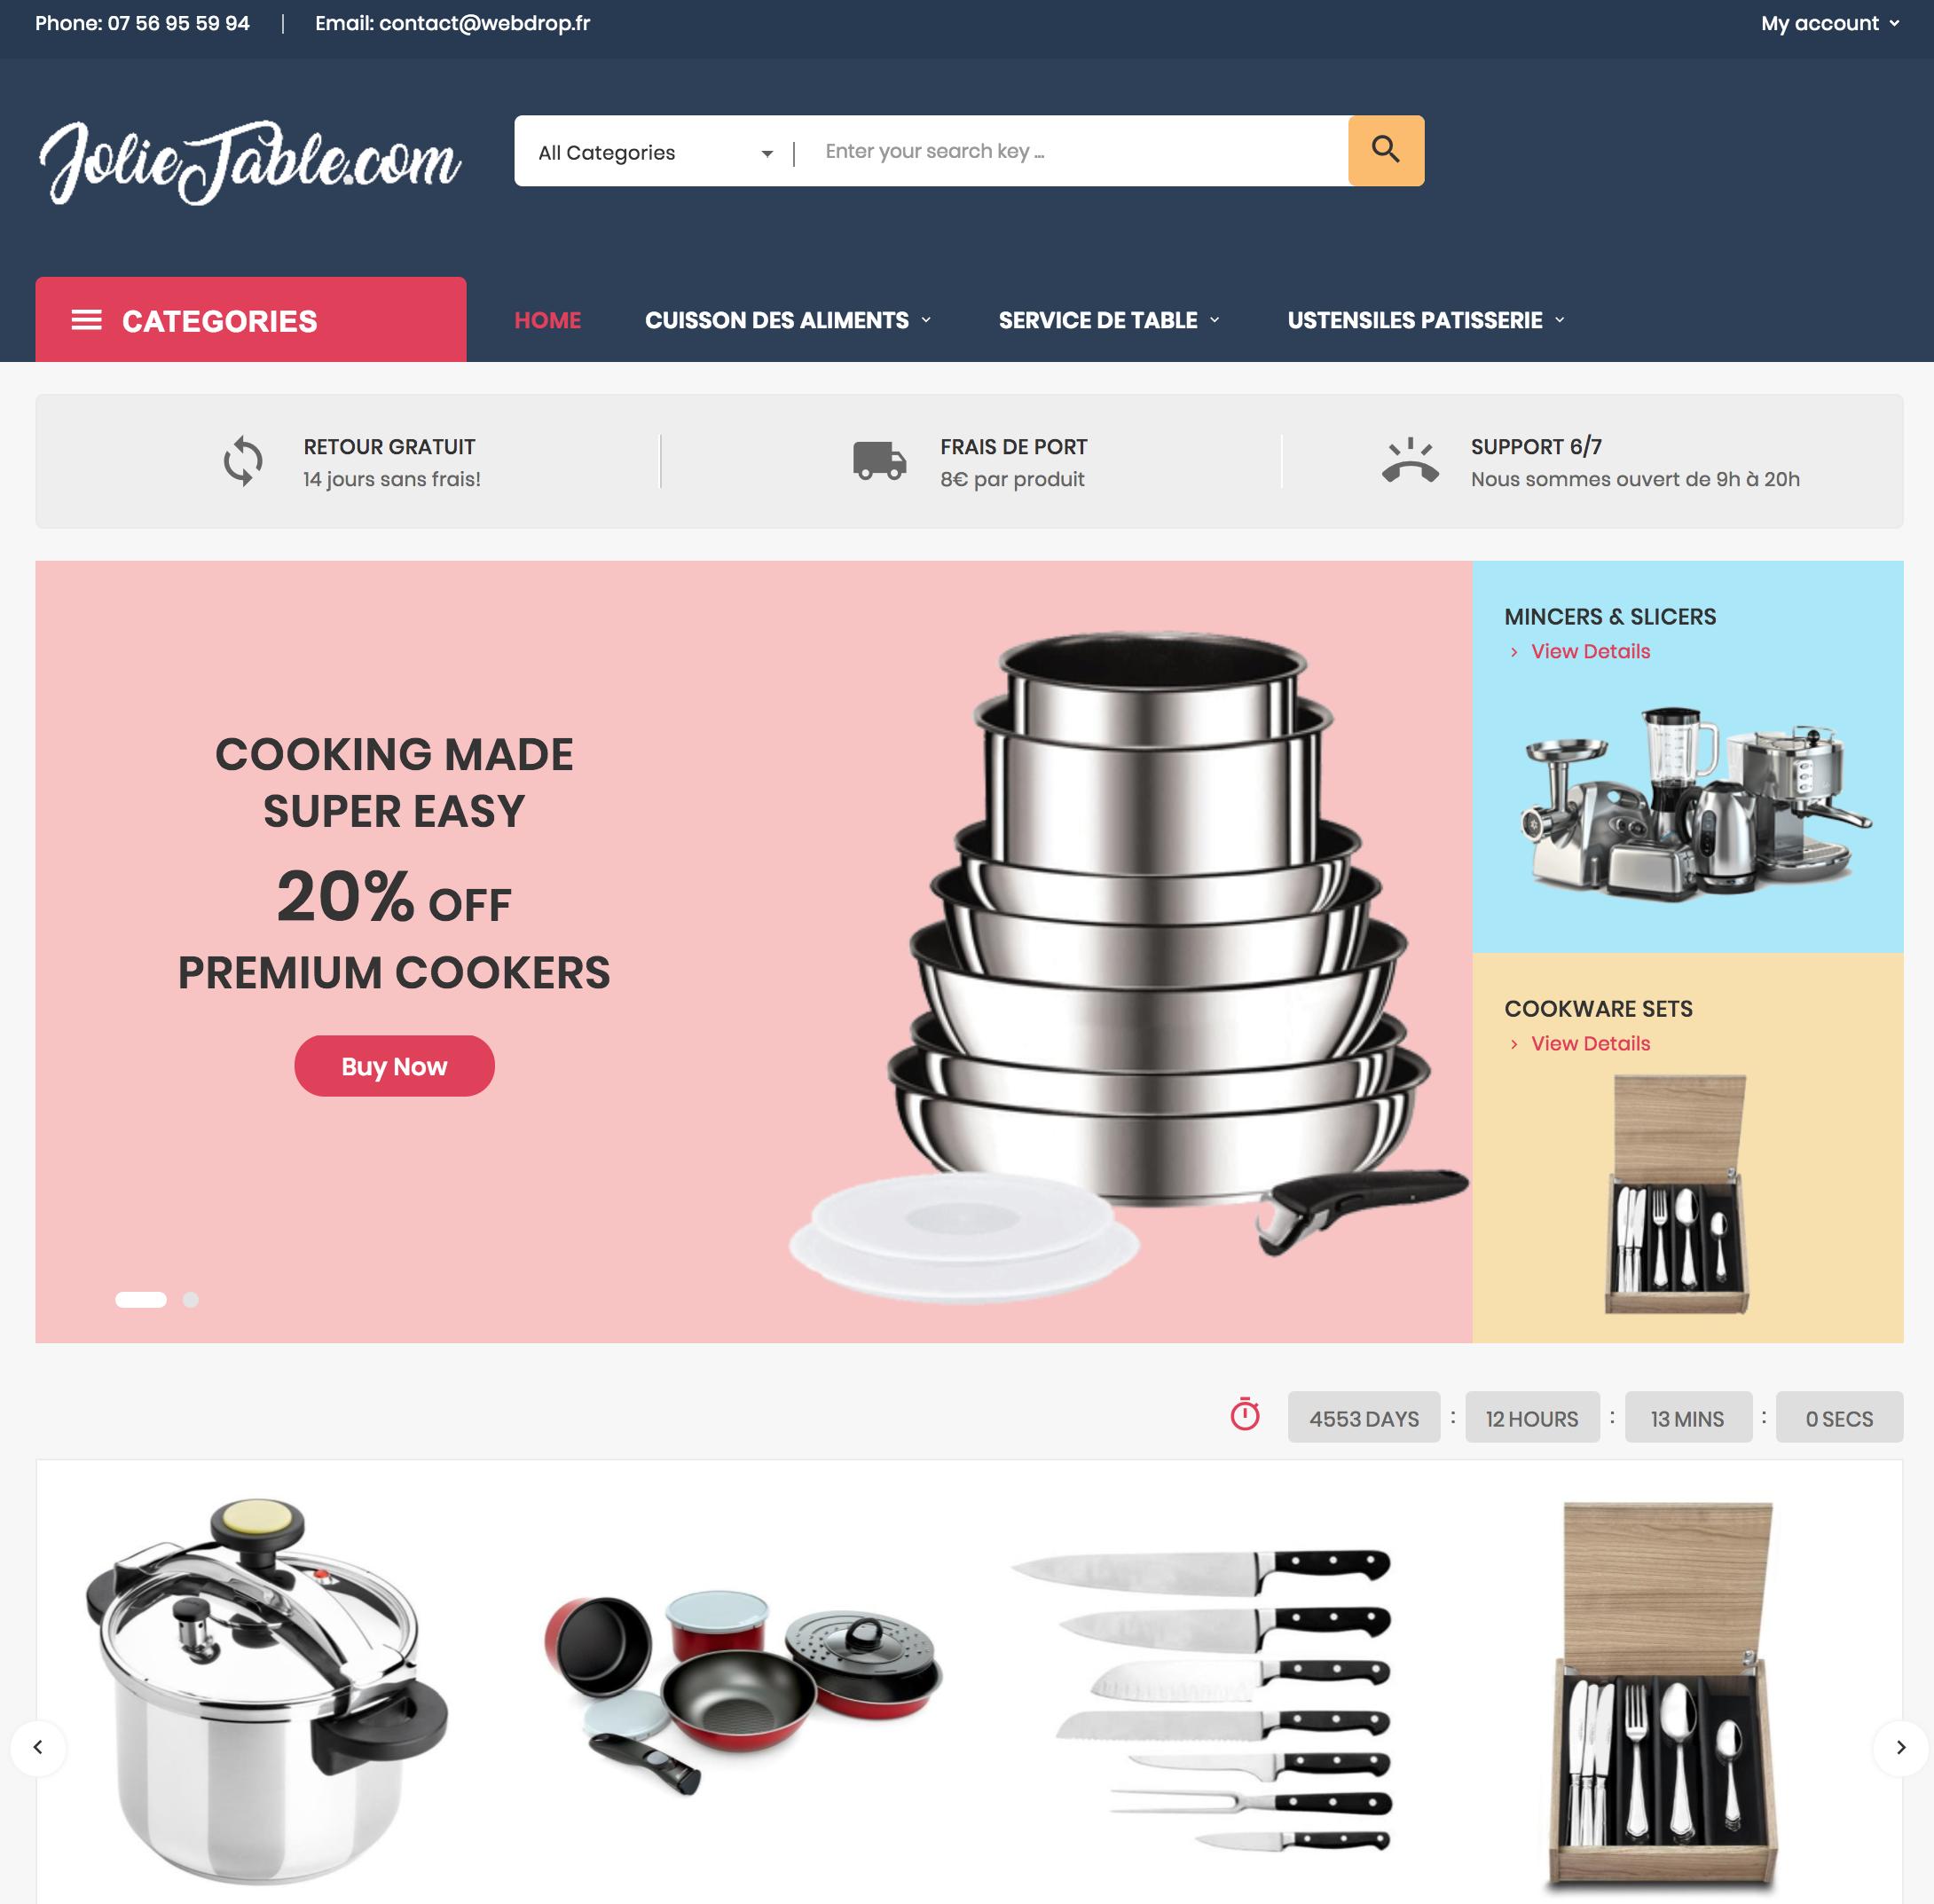 site e-commerce dropshipping à vendre